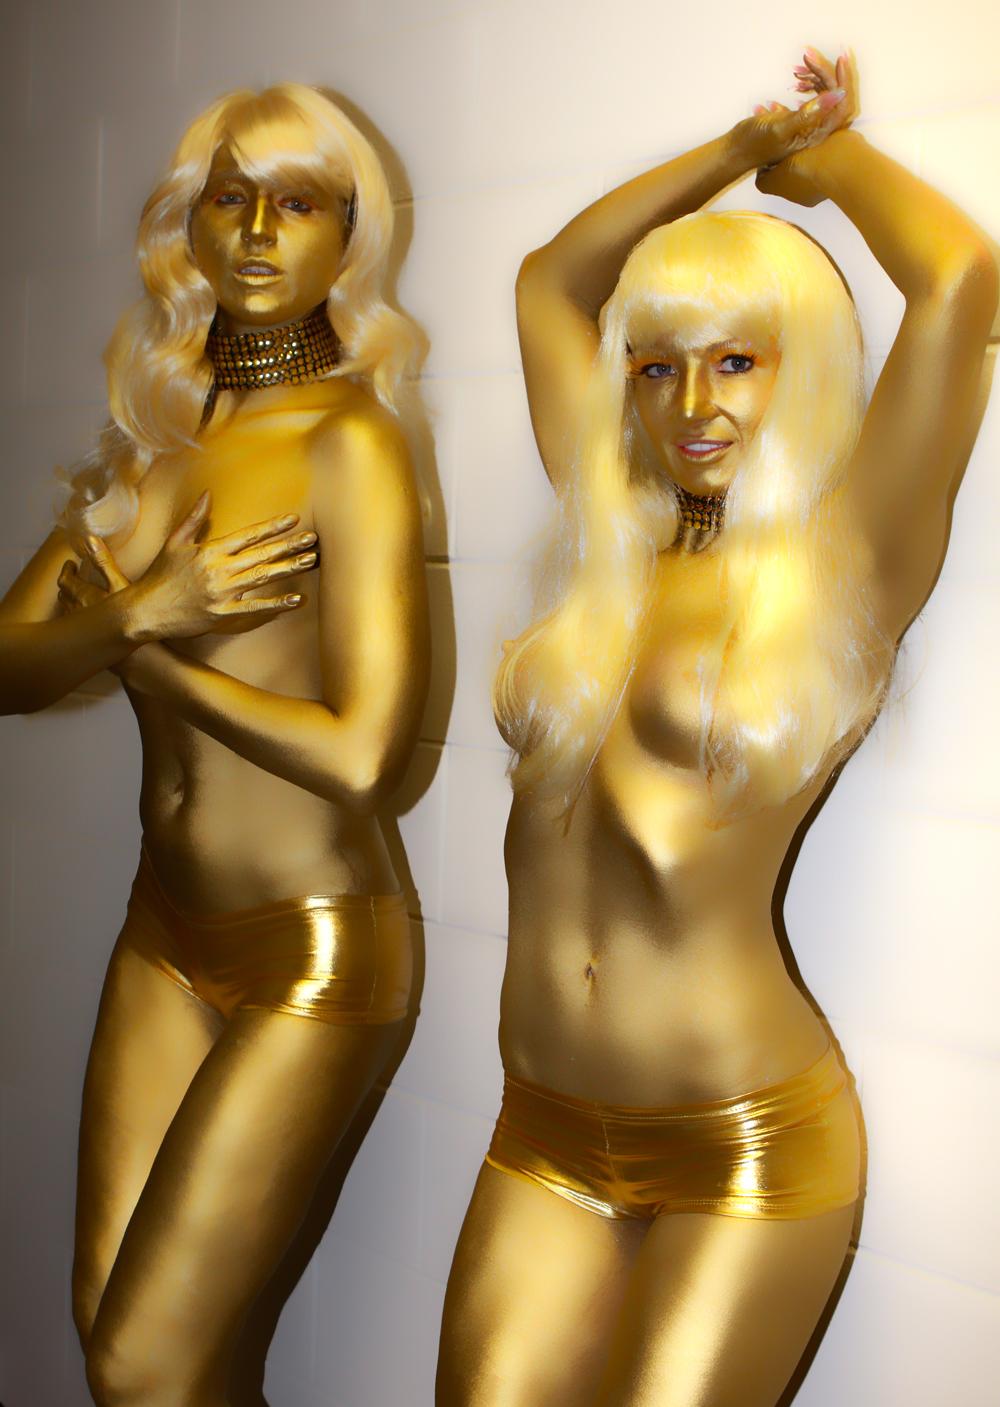 Human statue sex porn scenes